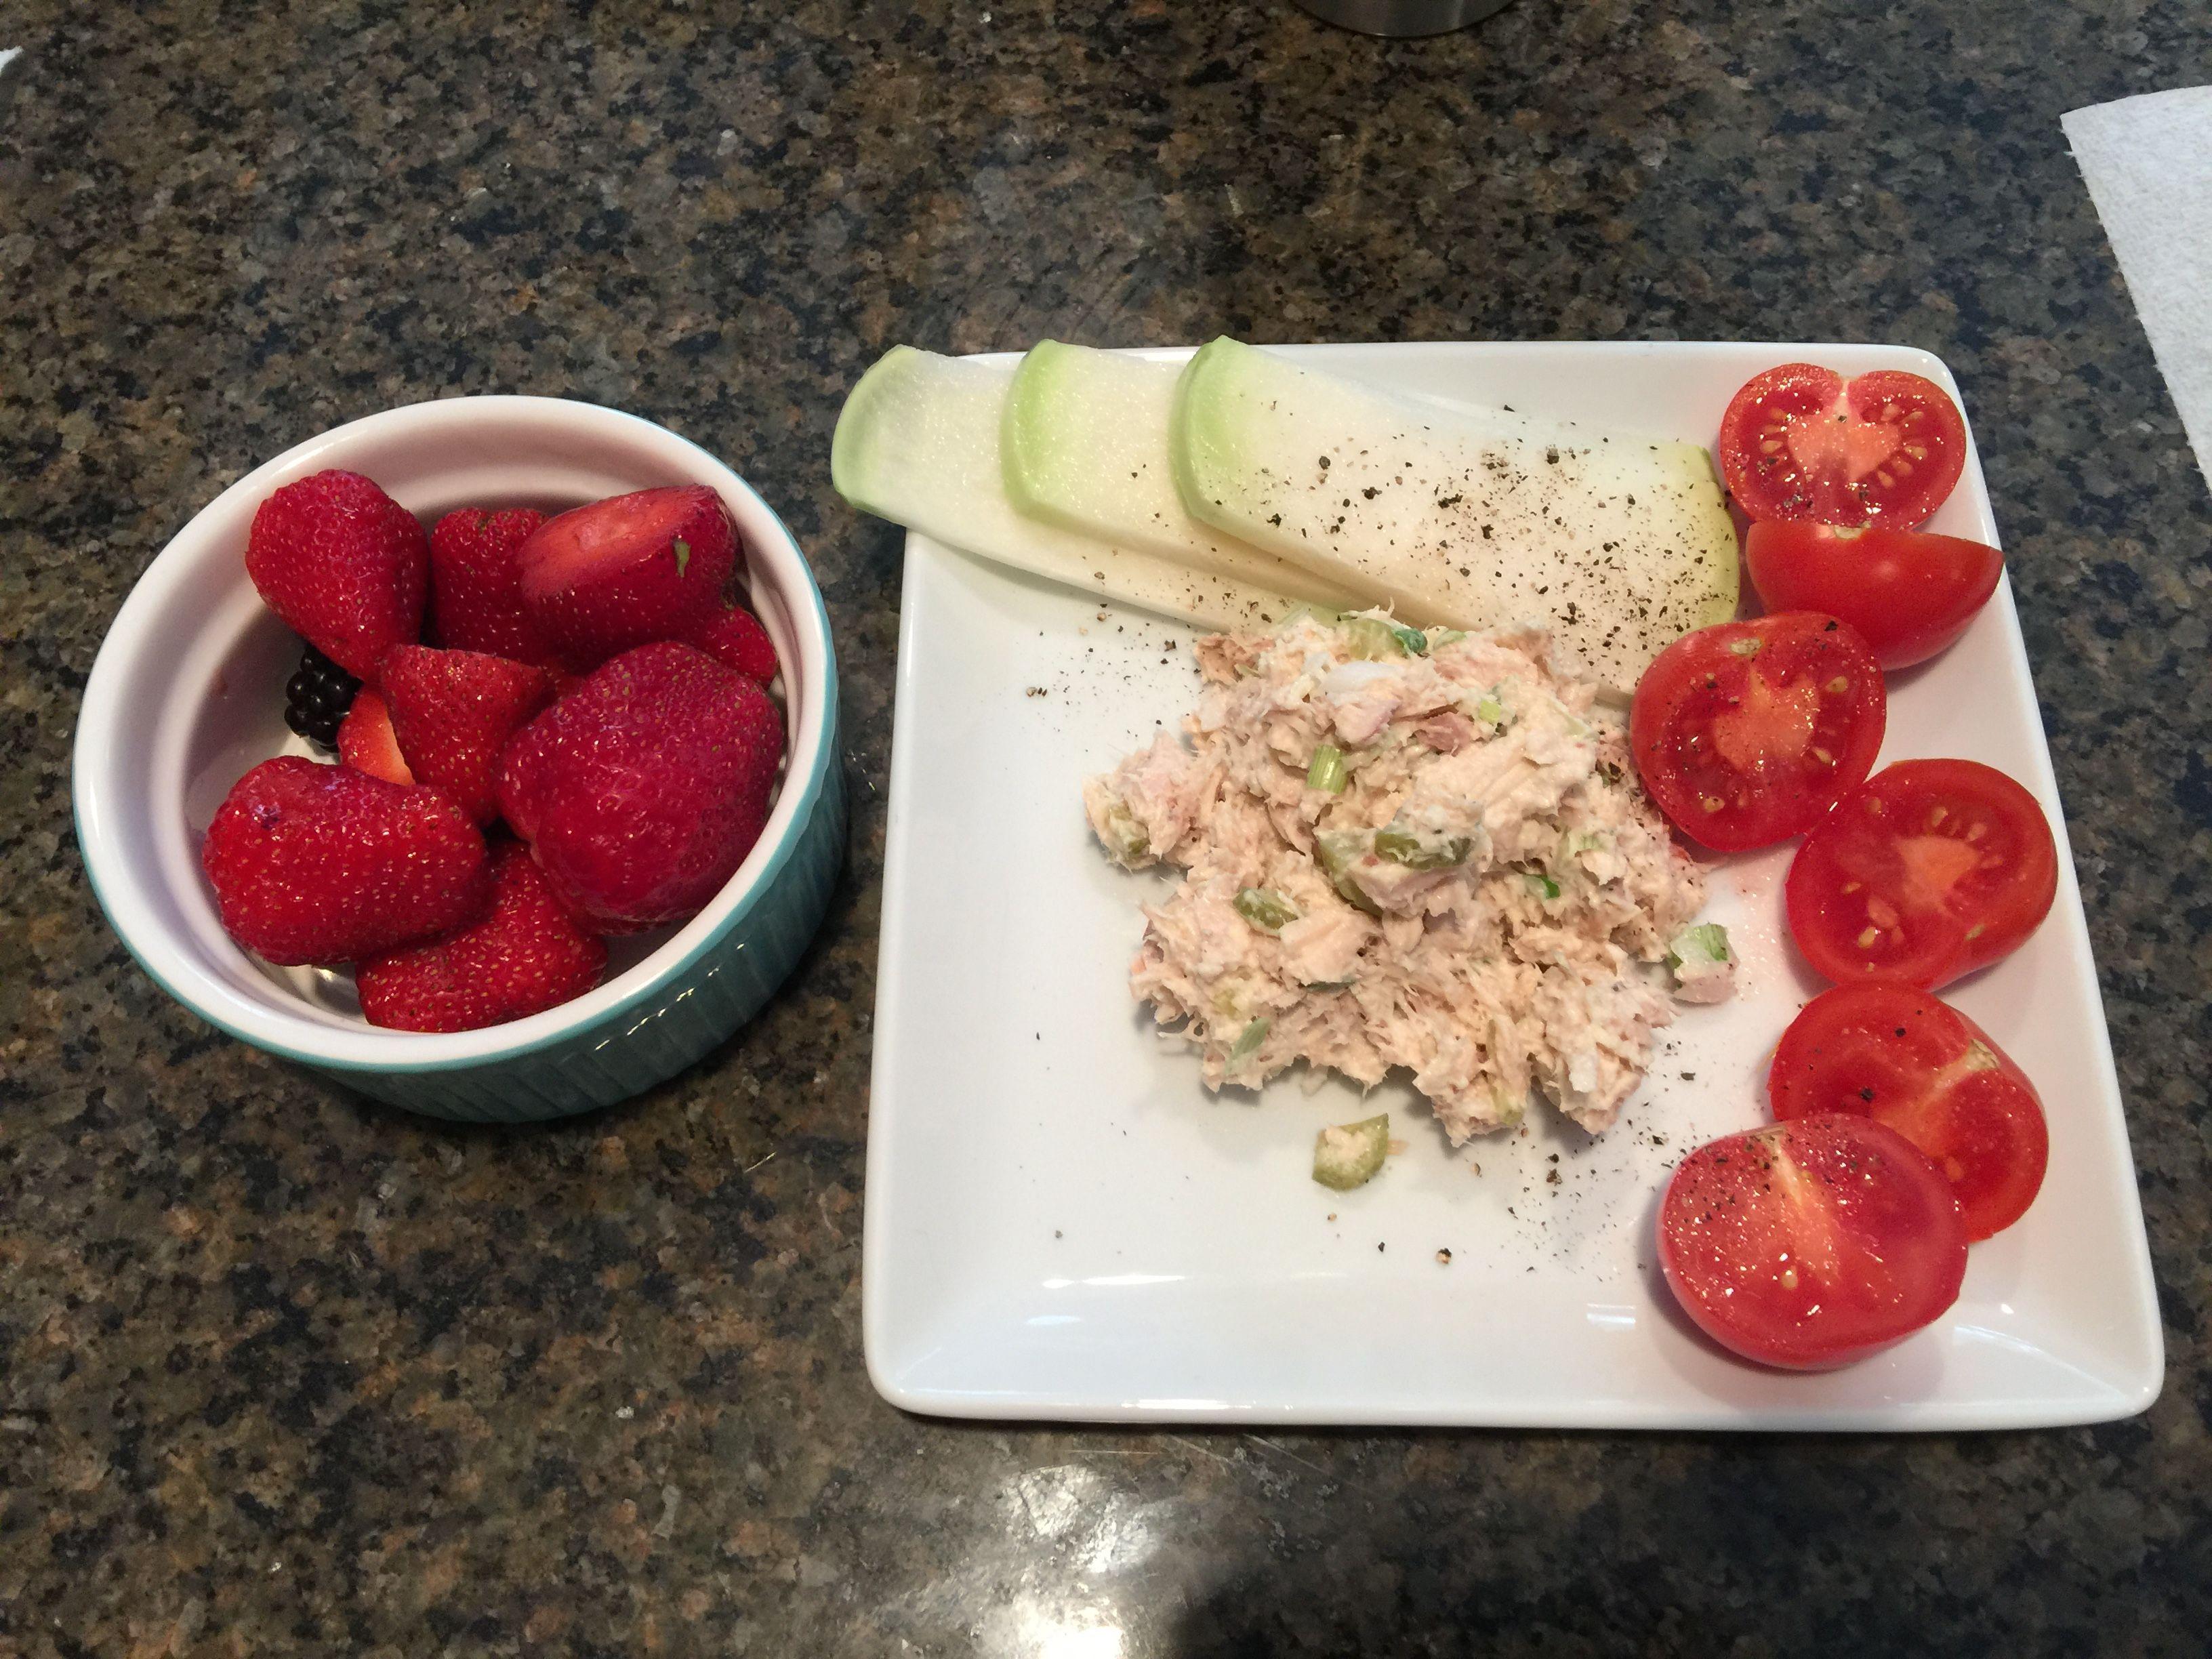 Brightline lunch 4 ounces tuna  Mayo 6 ounces veggies 6 ounces berries